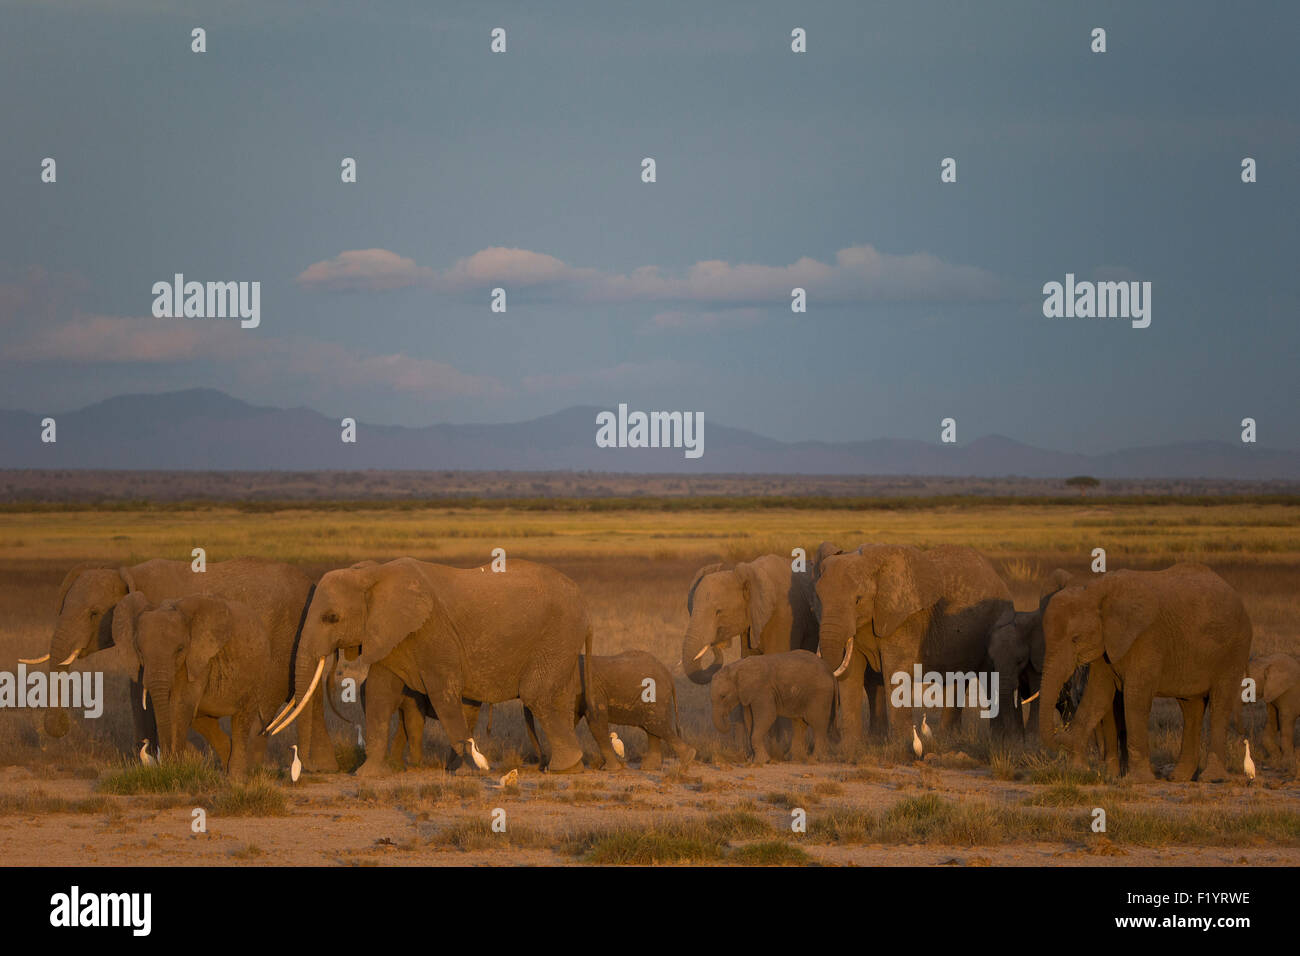 African Elephant (Loxodonta africana) Herd grazing at Amboseli National Park Kenya - Stock Image